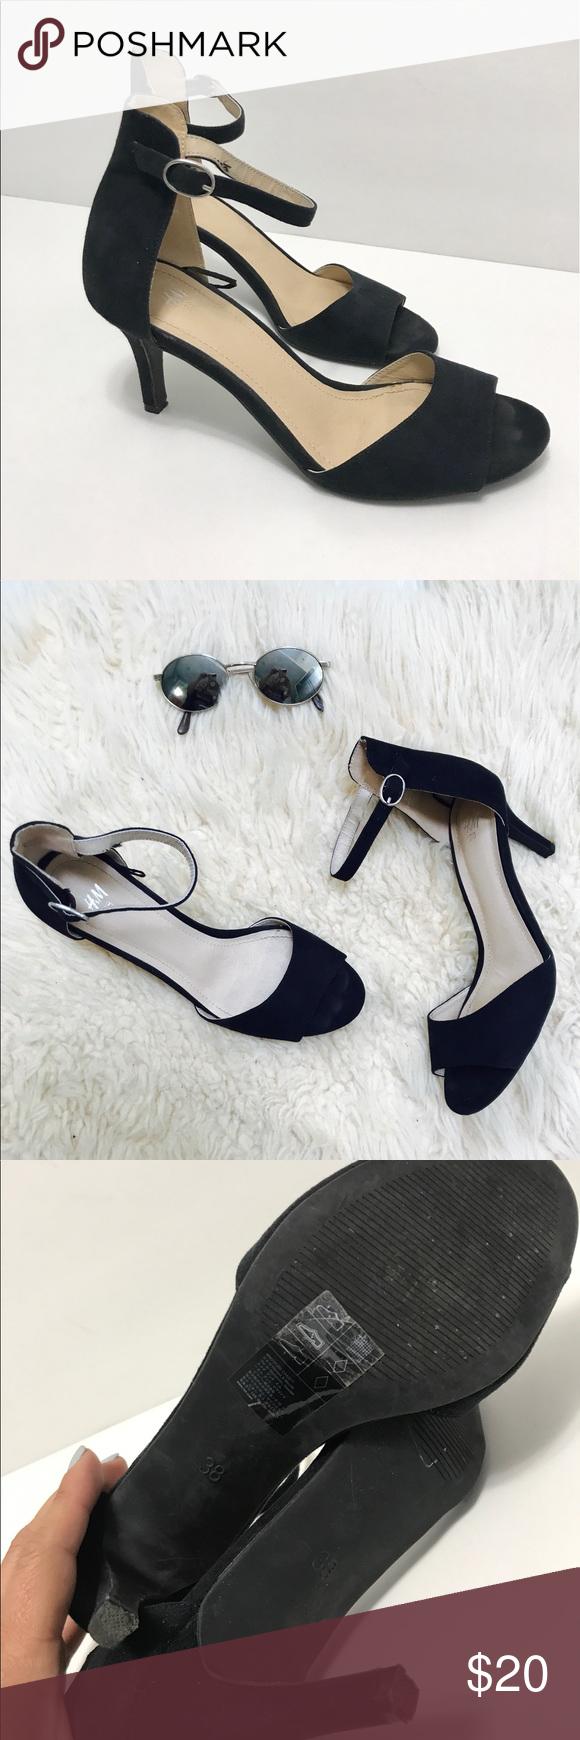 H M Black Heel Shoes 7 Black Shoes Heels Heels H M Shoes